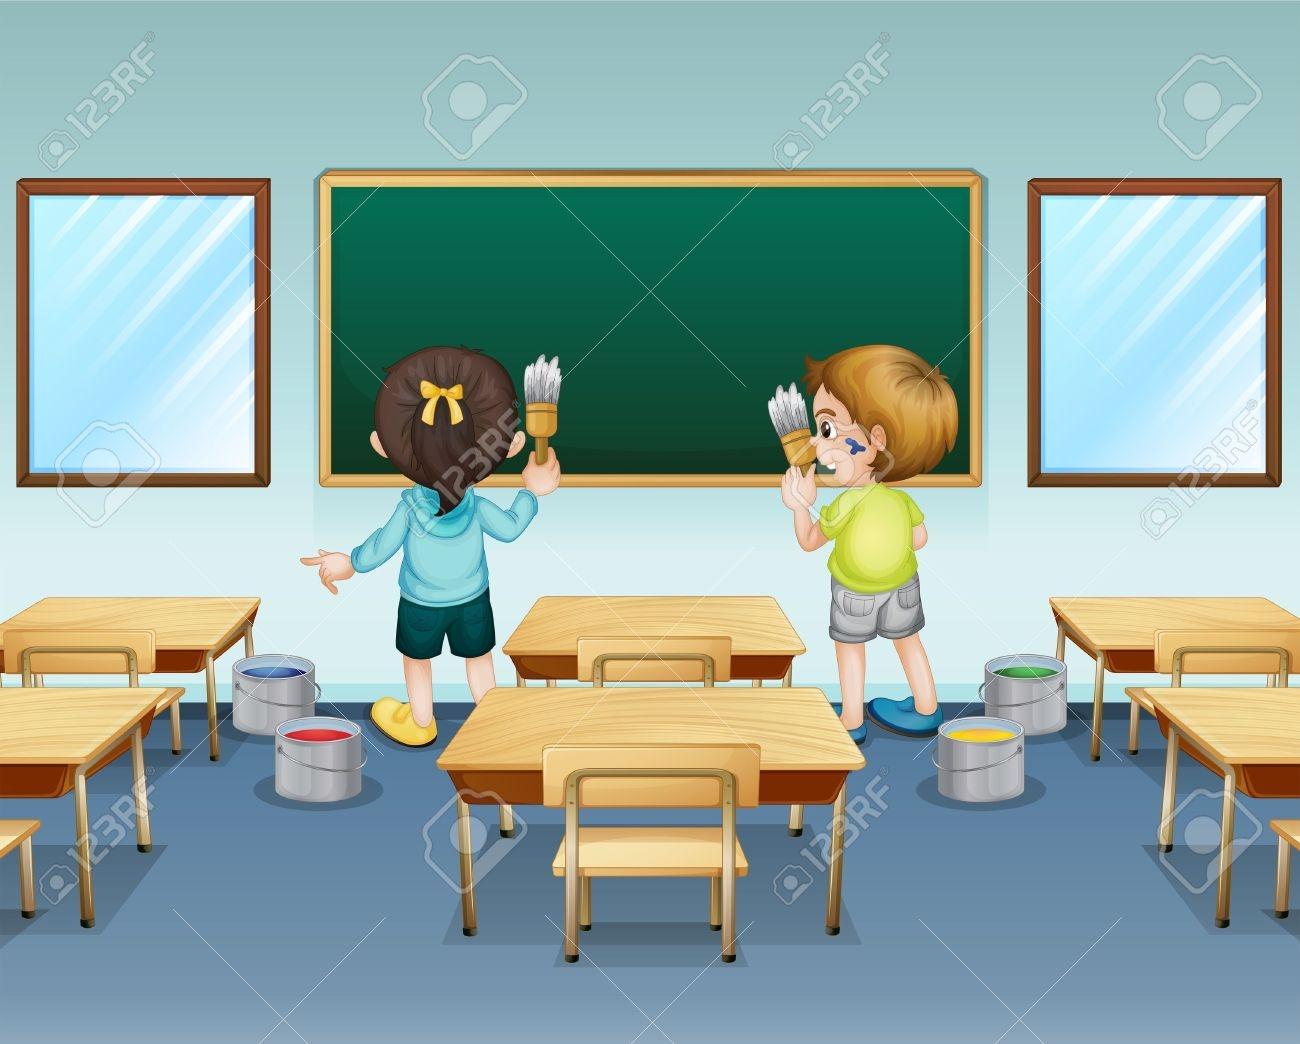 Clean Classroom Clipart